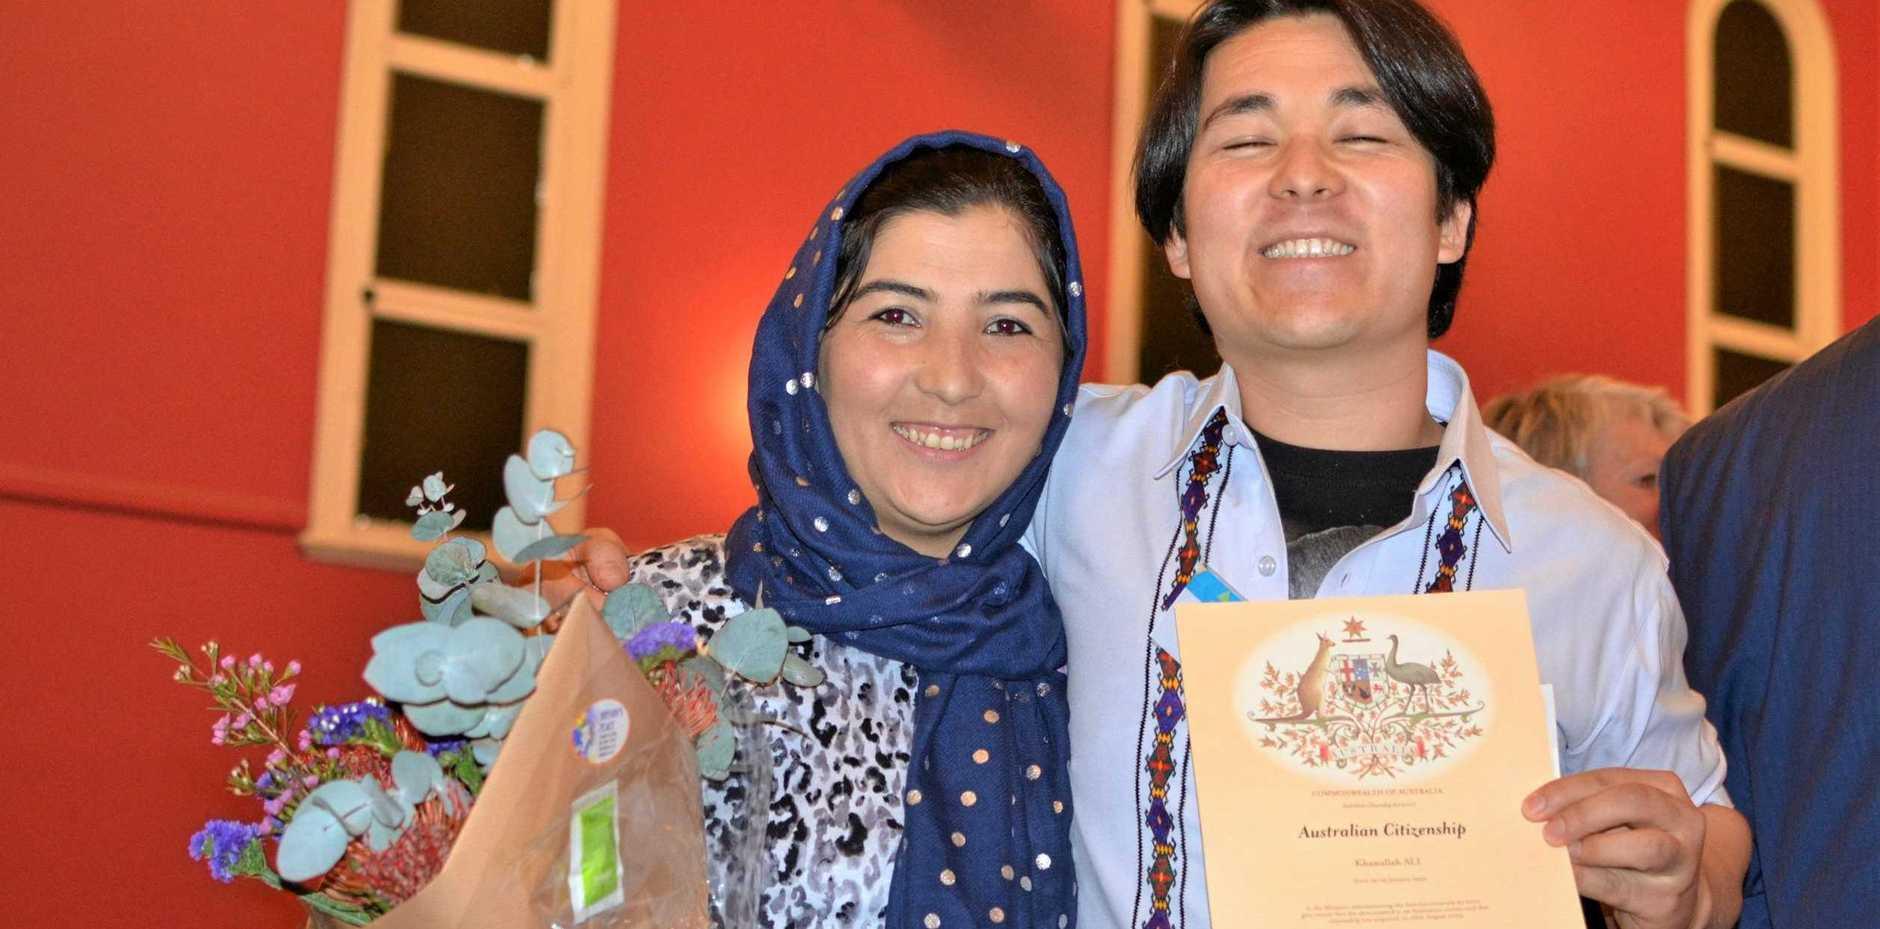 AT LONG LAST: Ali Khanullah is proud to become an Australian citizen in front of his wife Farfarisha Nazari.